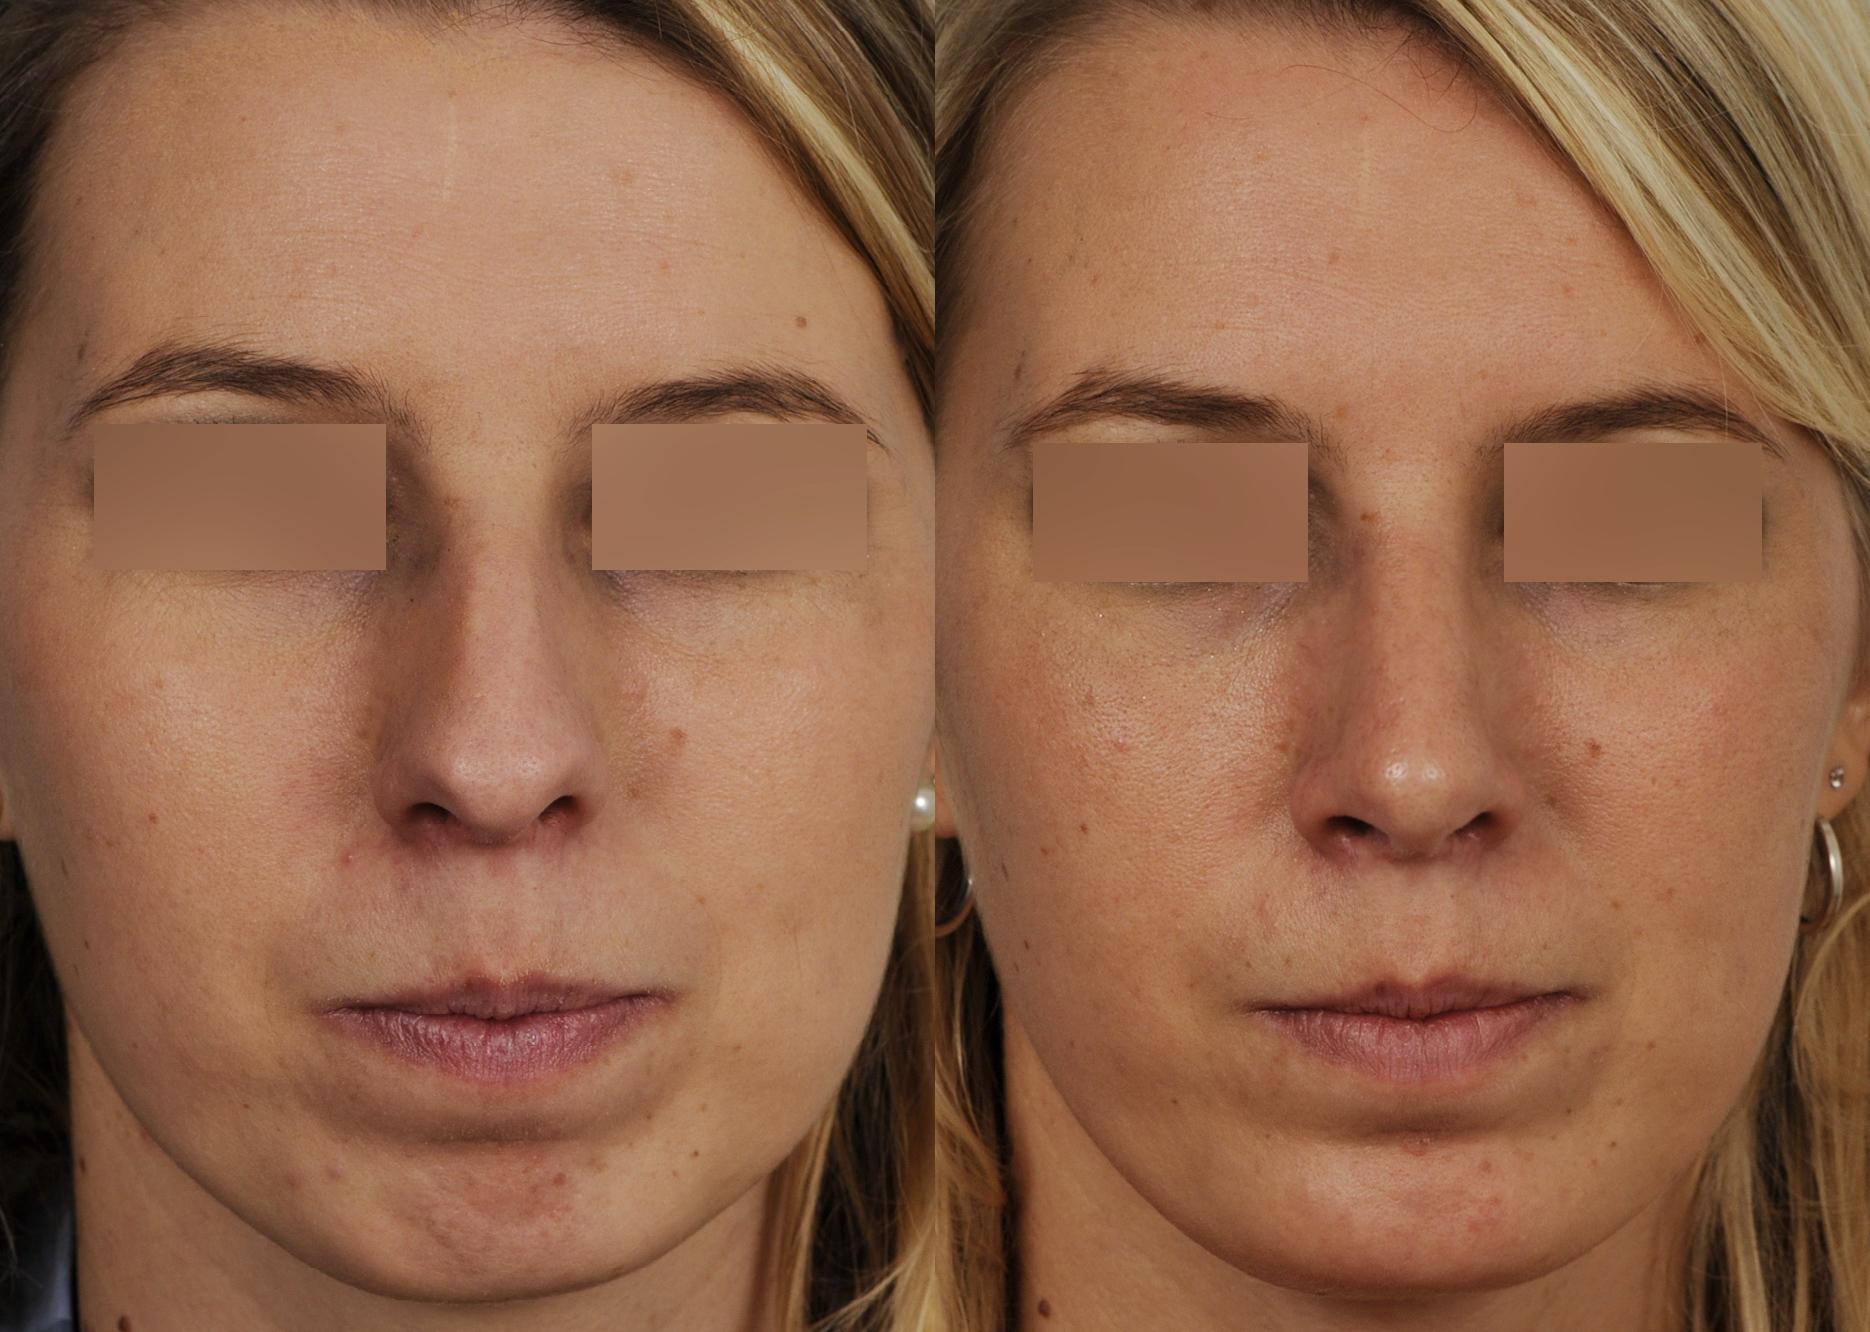 profiloplastie-avancee-du-menton-par-prothese_5468_duologo